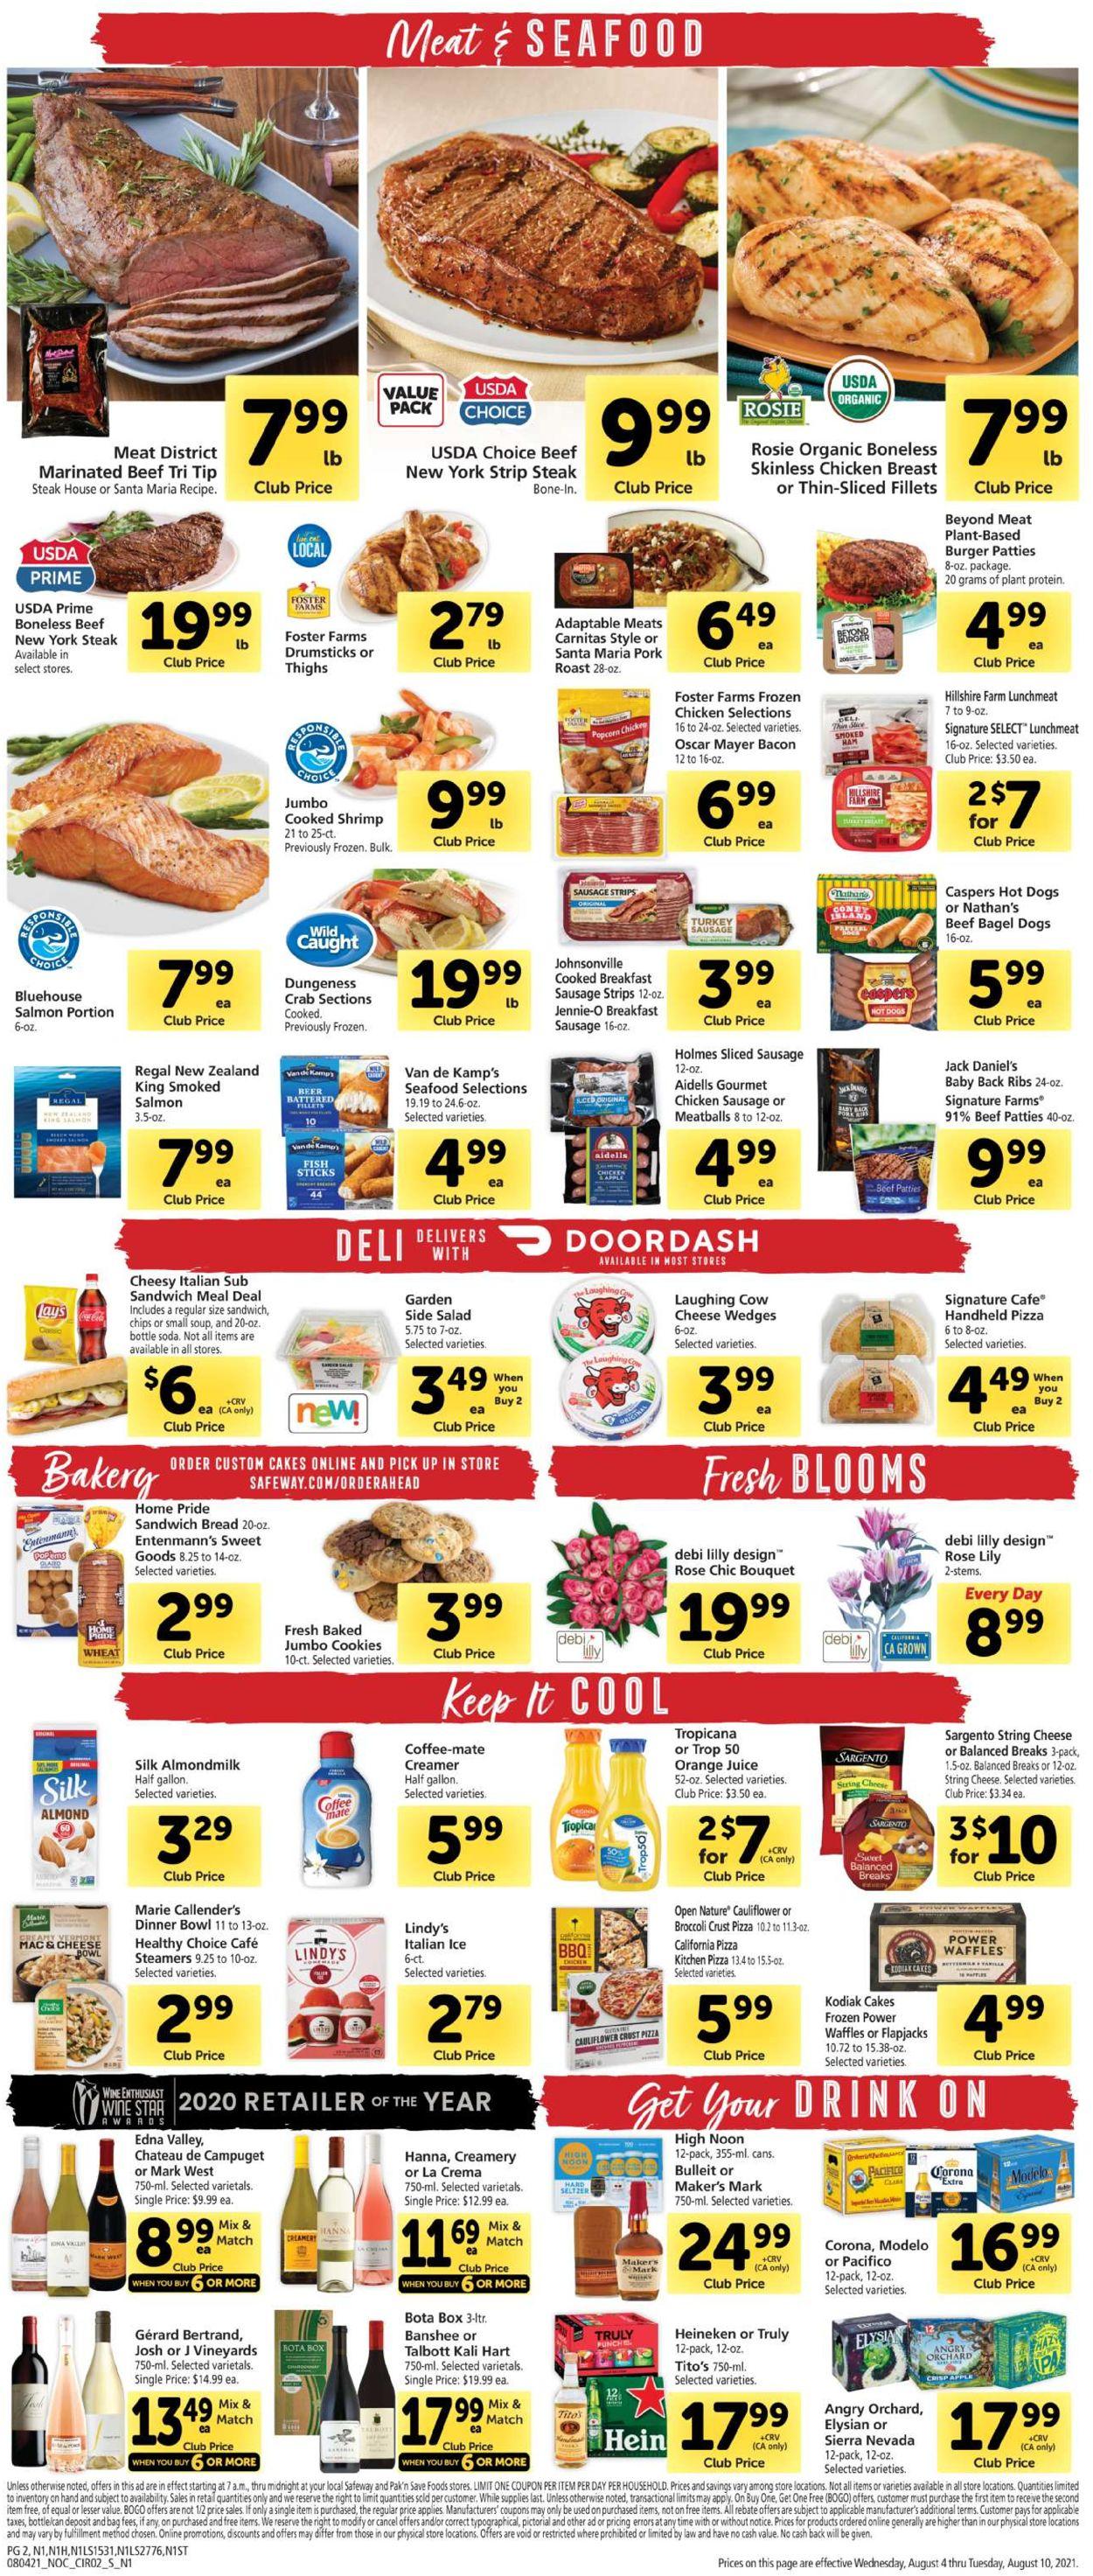 Safeway Weekly Ad Circular - valid 08/04-08/10/2021 (Page 2)